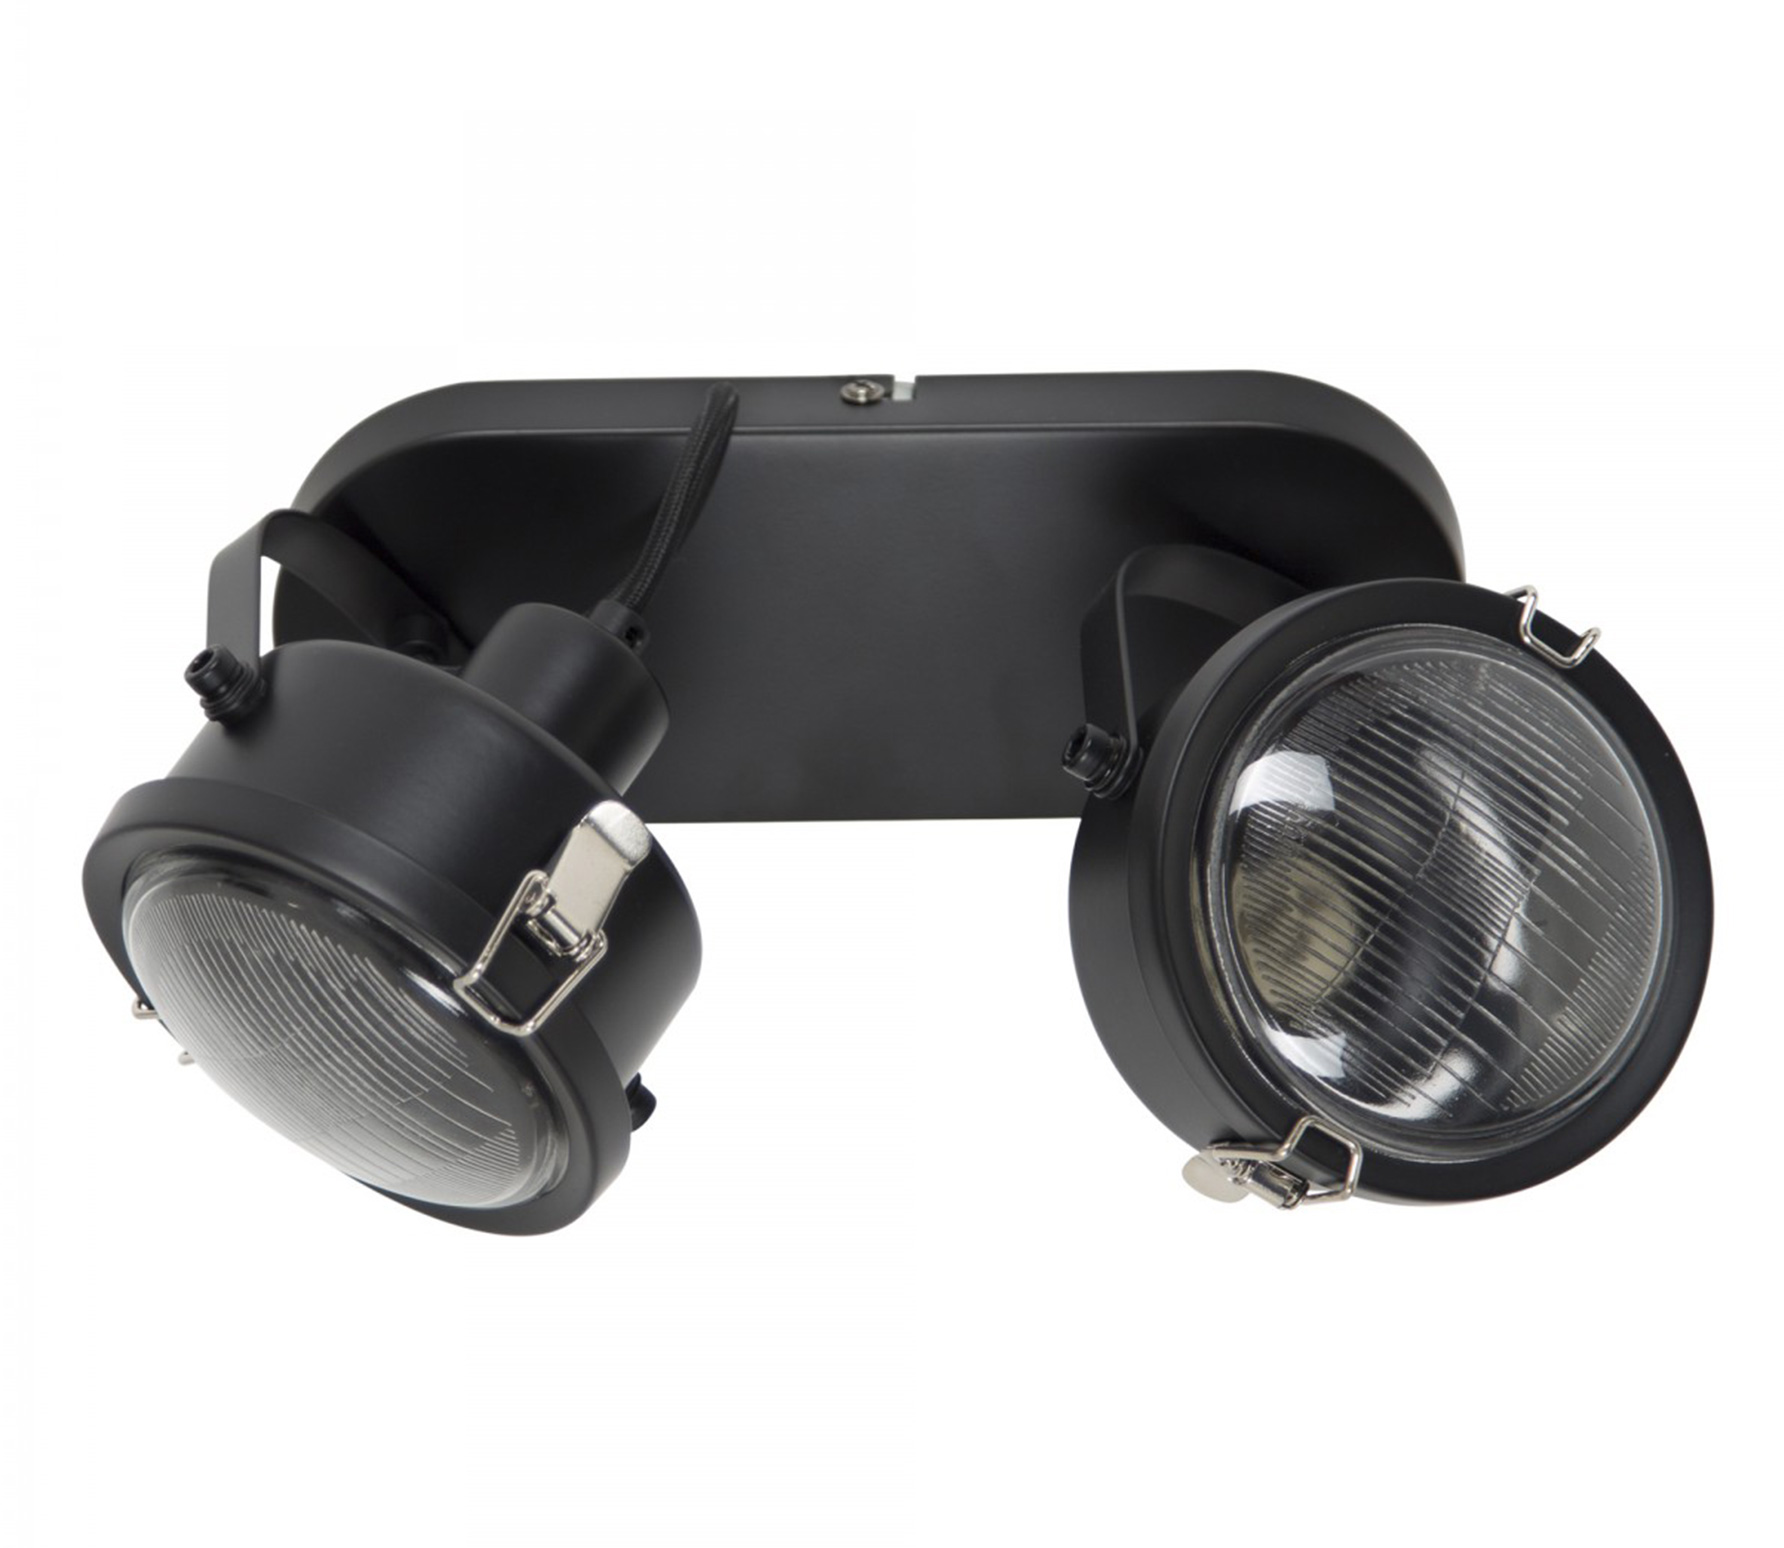 Satellite 2 plafondlamp/wandlamp zwart metaal